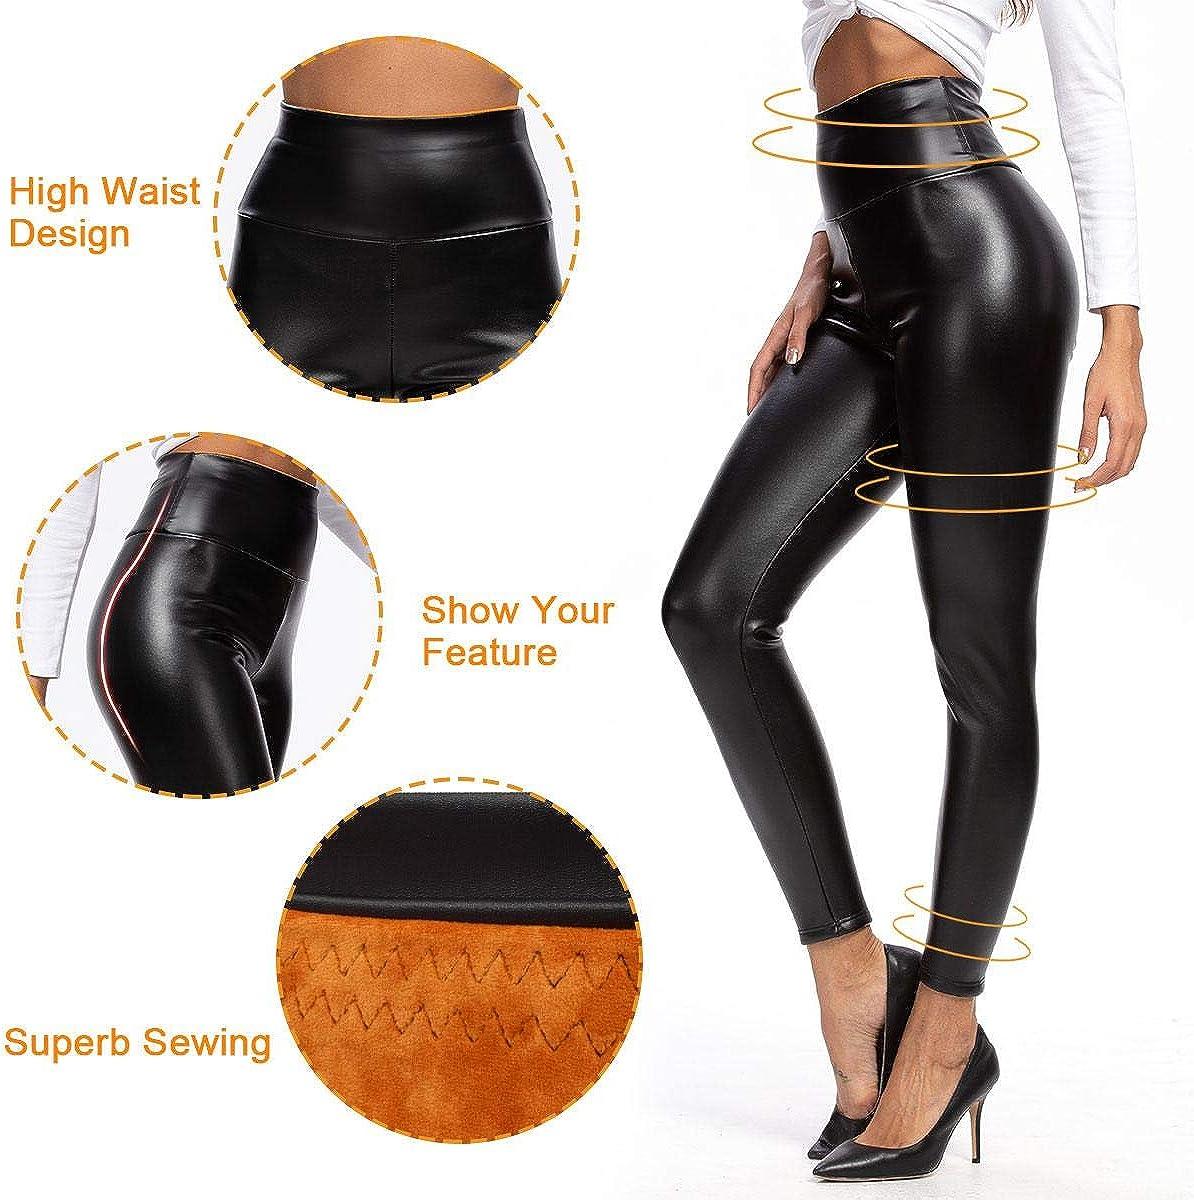 heekpek Leggings Pantaloni da Donna in Pelle Pantaloni Collant a Vita Alta Aspetto in Similpelle PU Soft Stretch Skinny